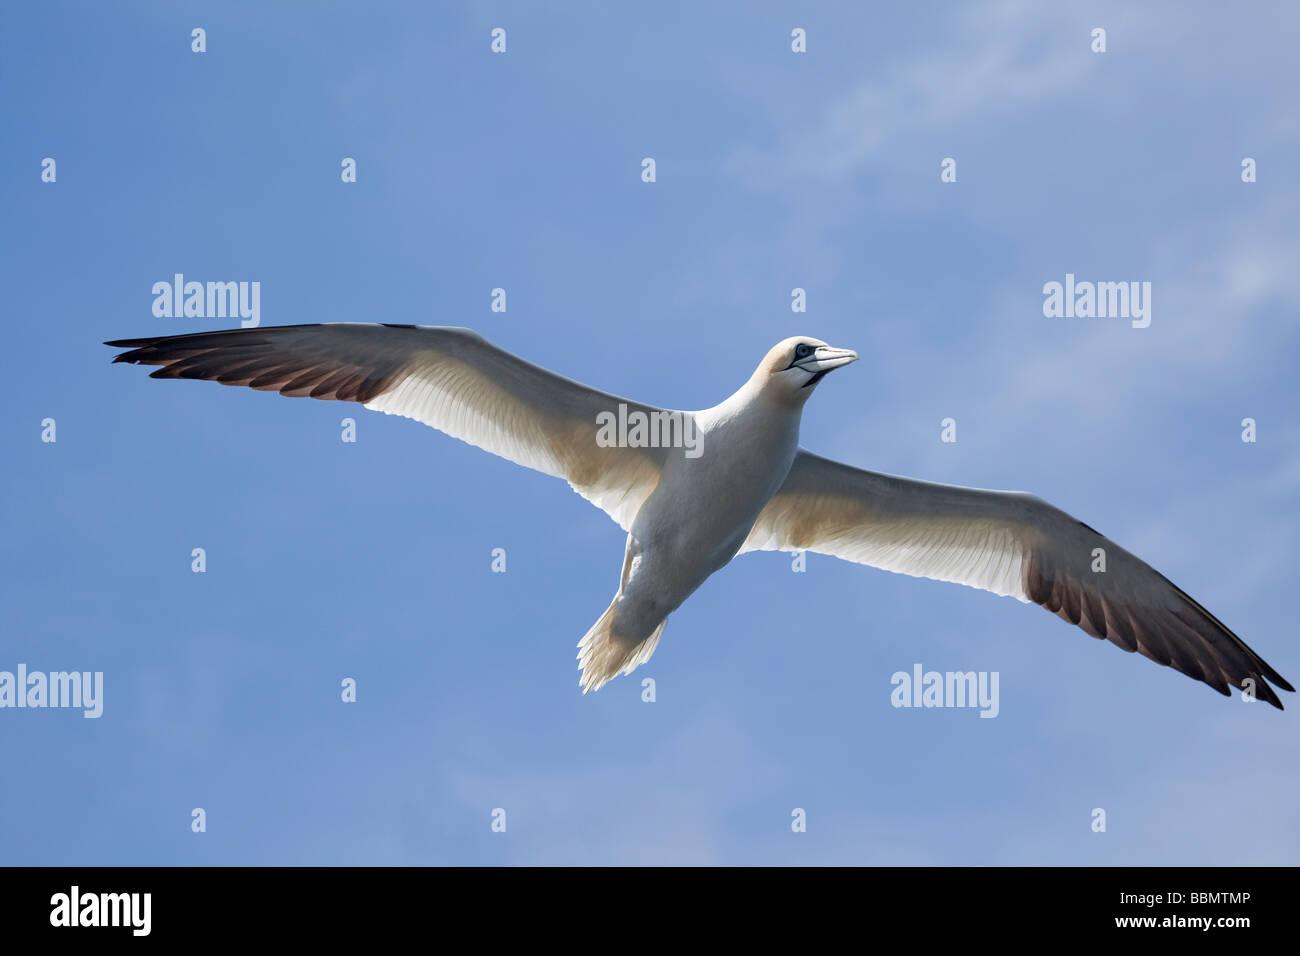 Northern Gannet, Morus bassanus (Sula bassana), in flight near its nesting colony on Ailsa Craig, nine miles off - Stock Image